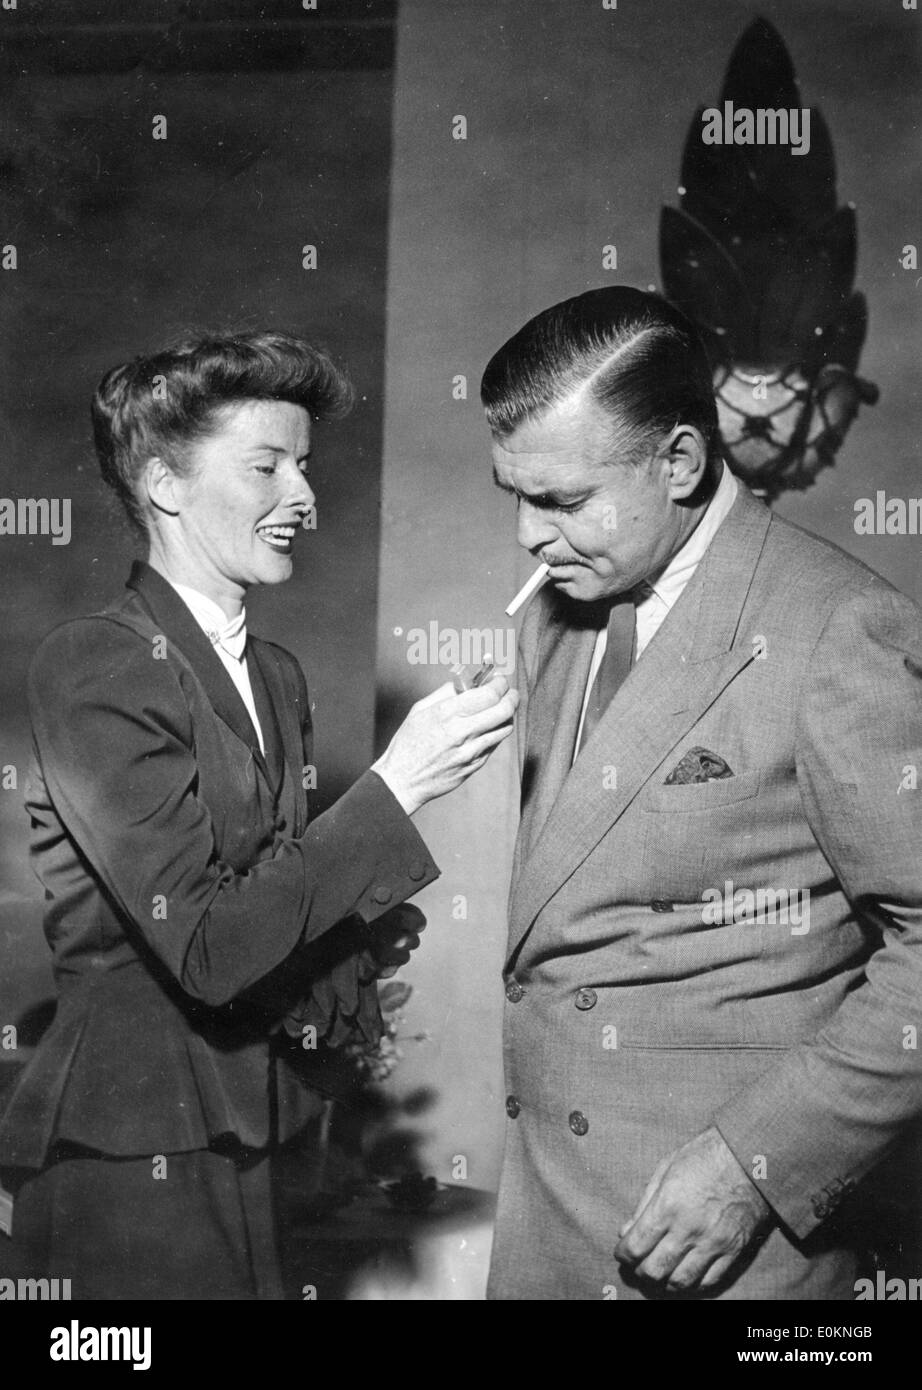 Actress Katharine Hepburn lighting a cigarette for Clark Gable - Stock Image